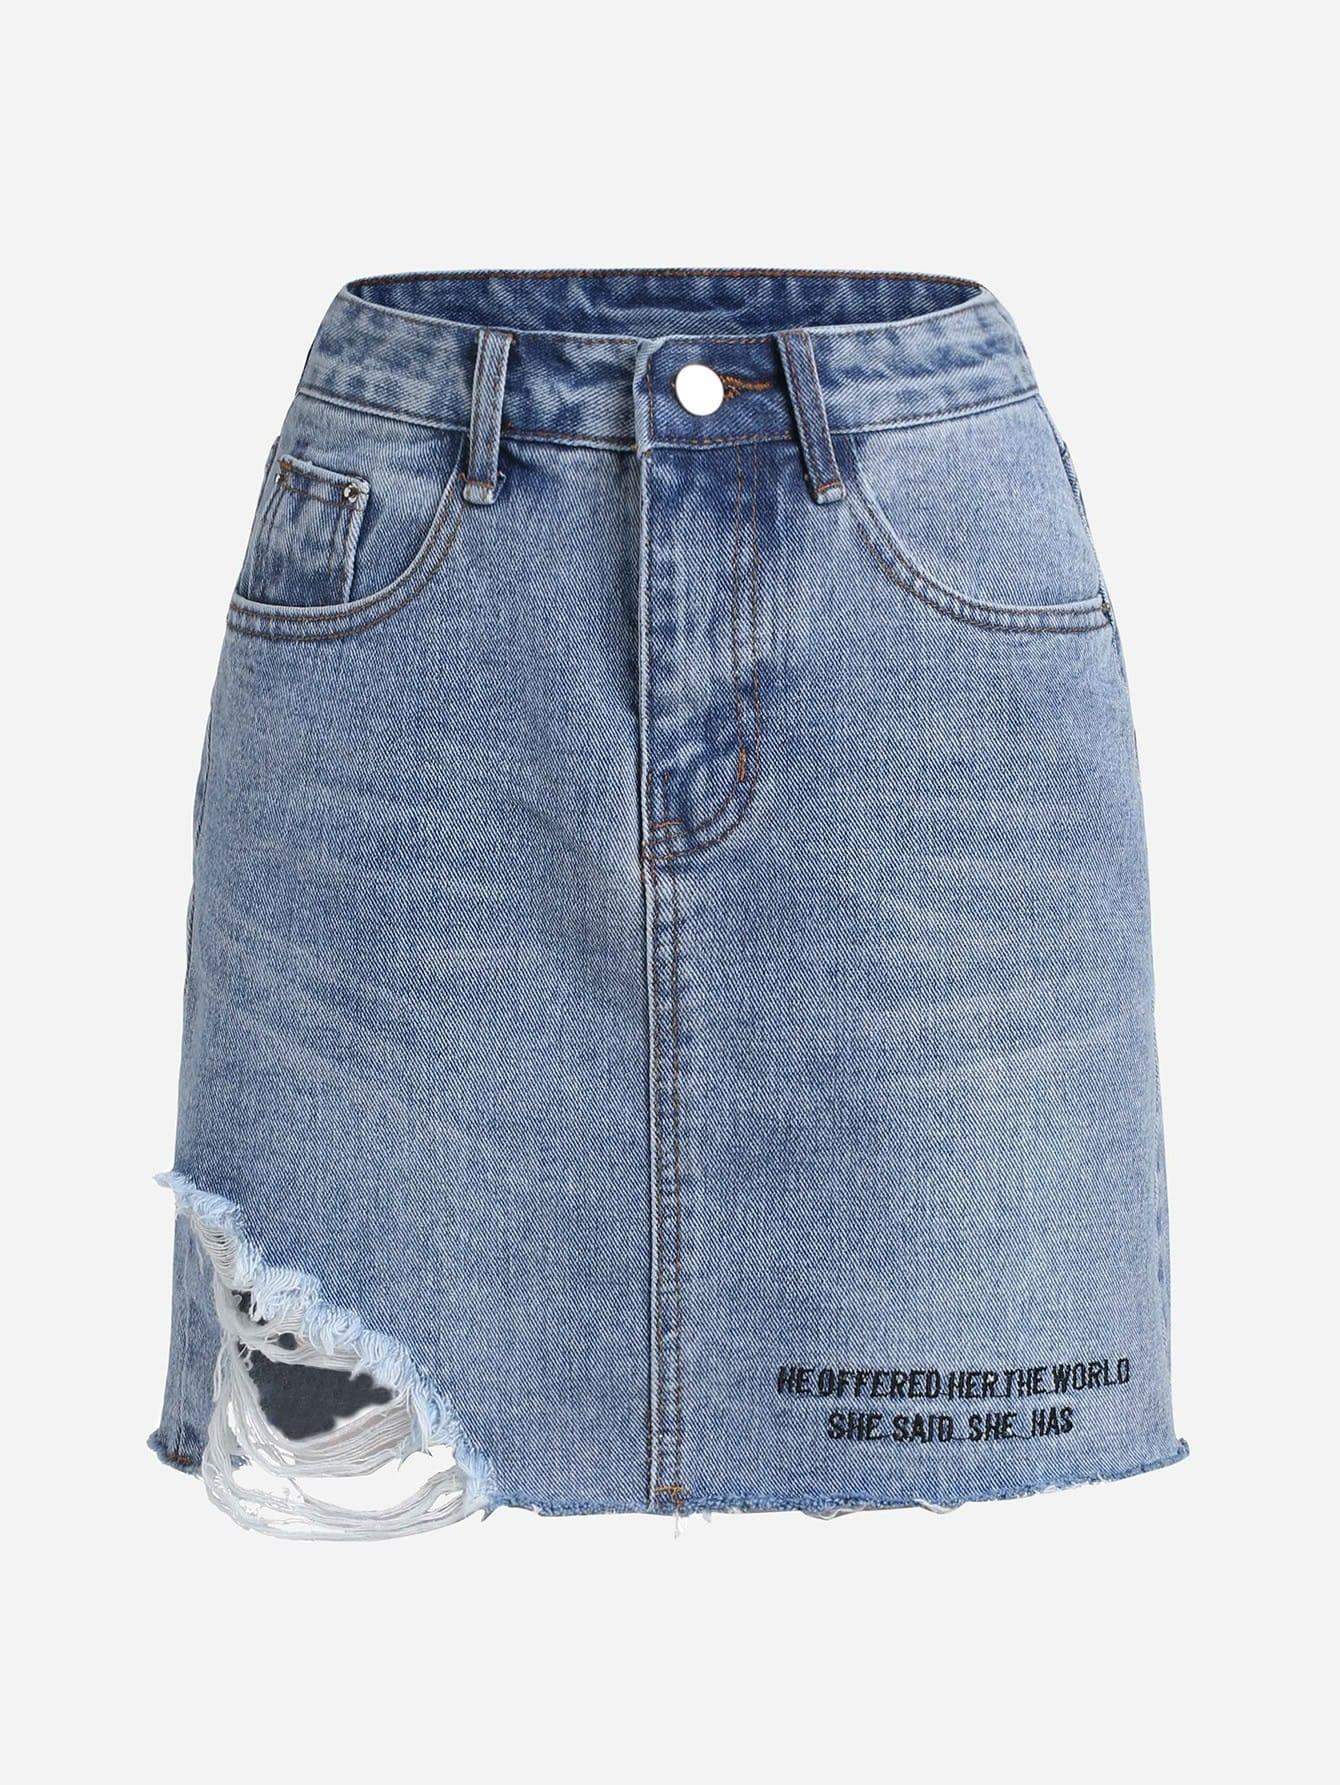 Letter Print Raw Hem Ripped Denim Skirt ripped raw hem denim skirt